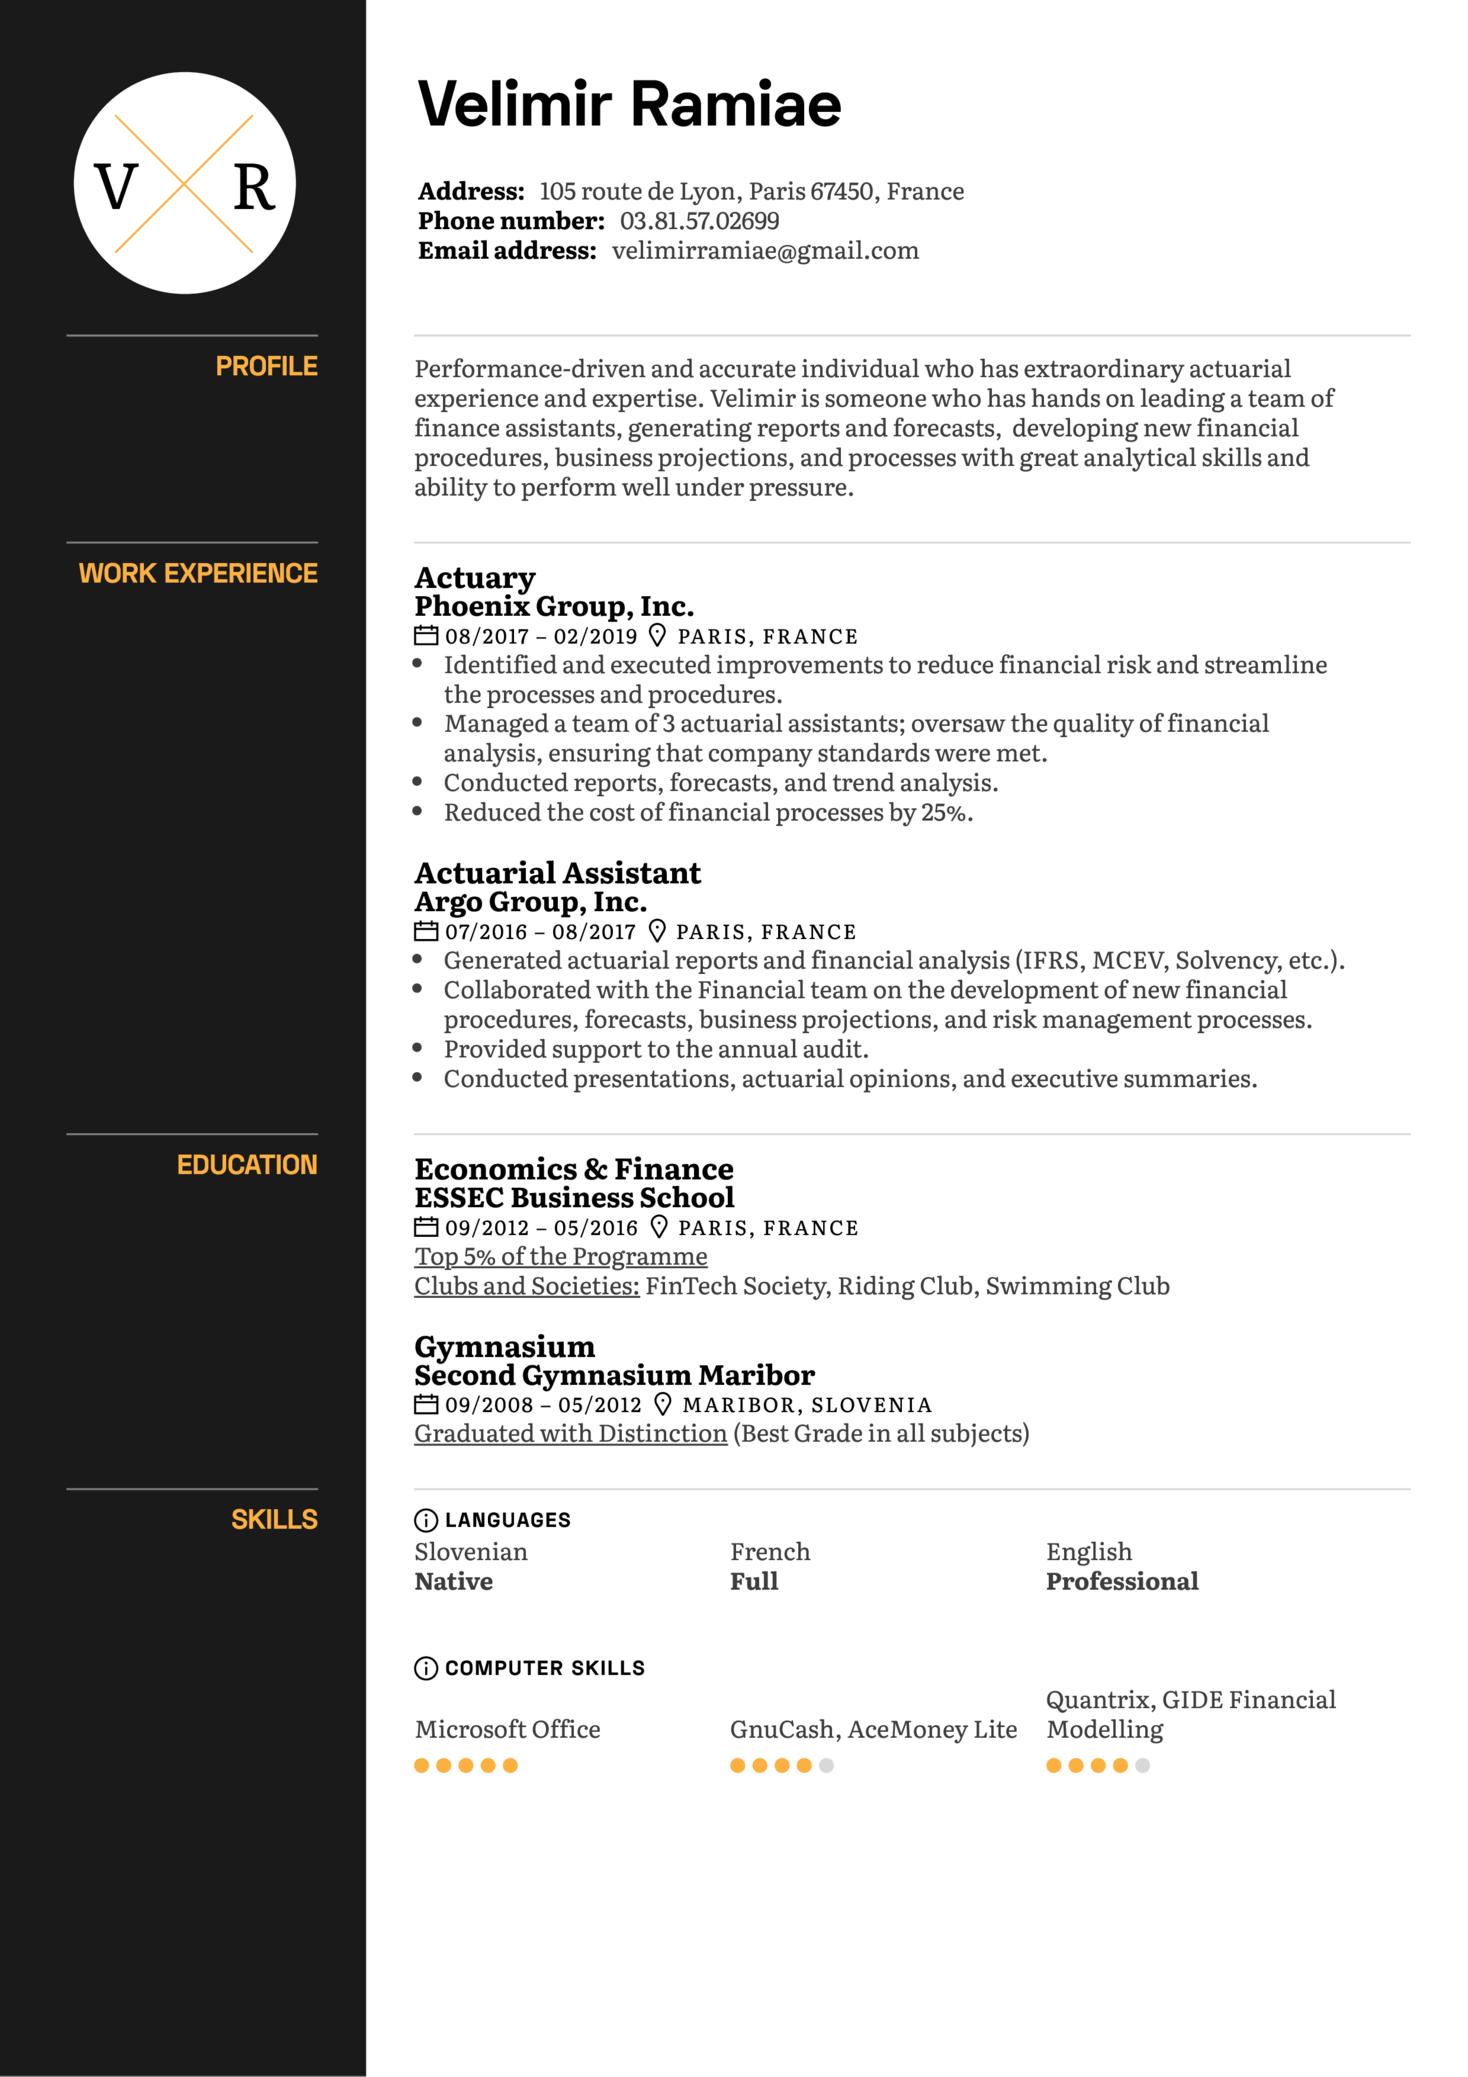 Actuary Resume Example (parte 1)